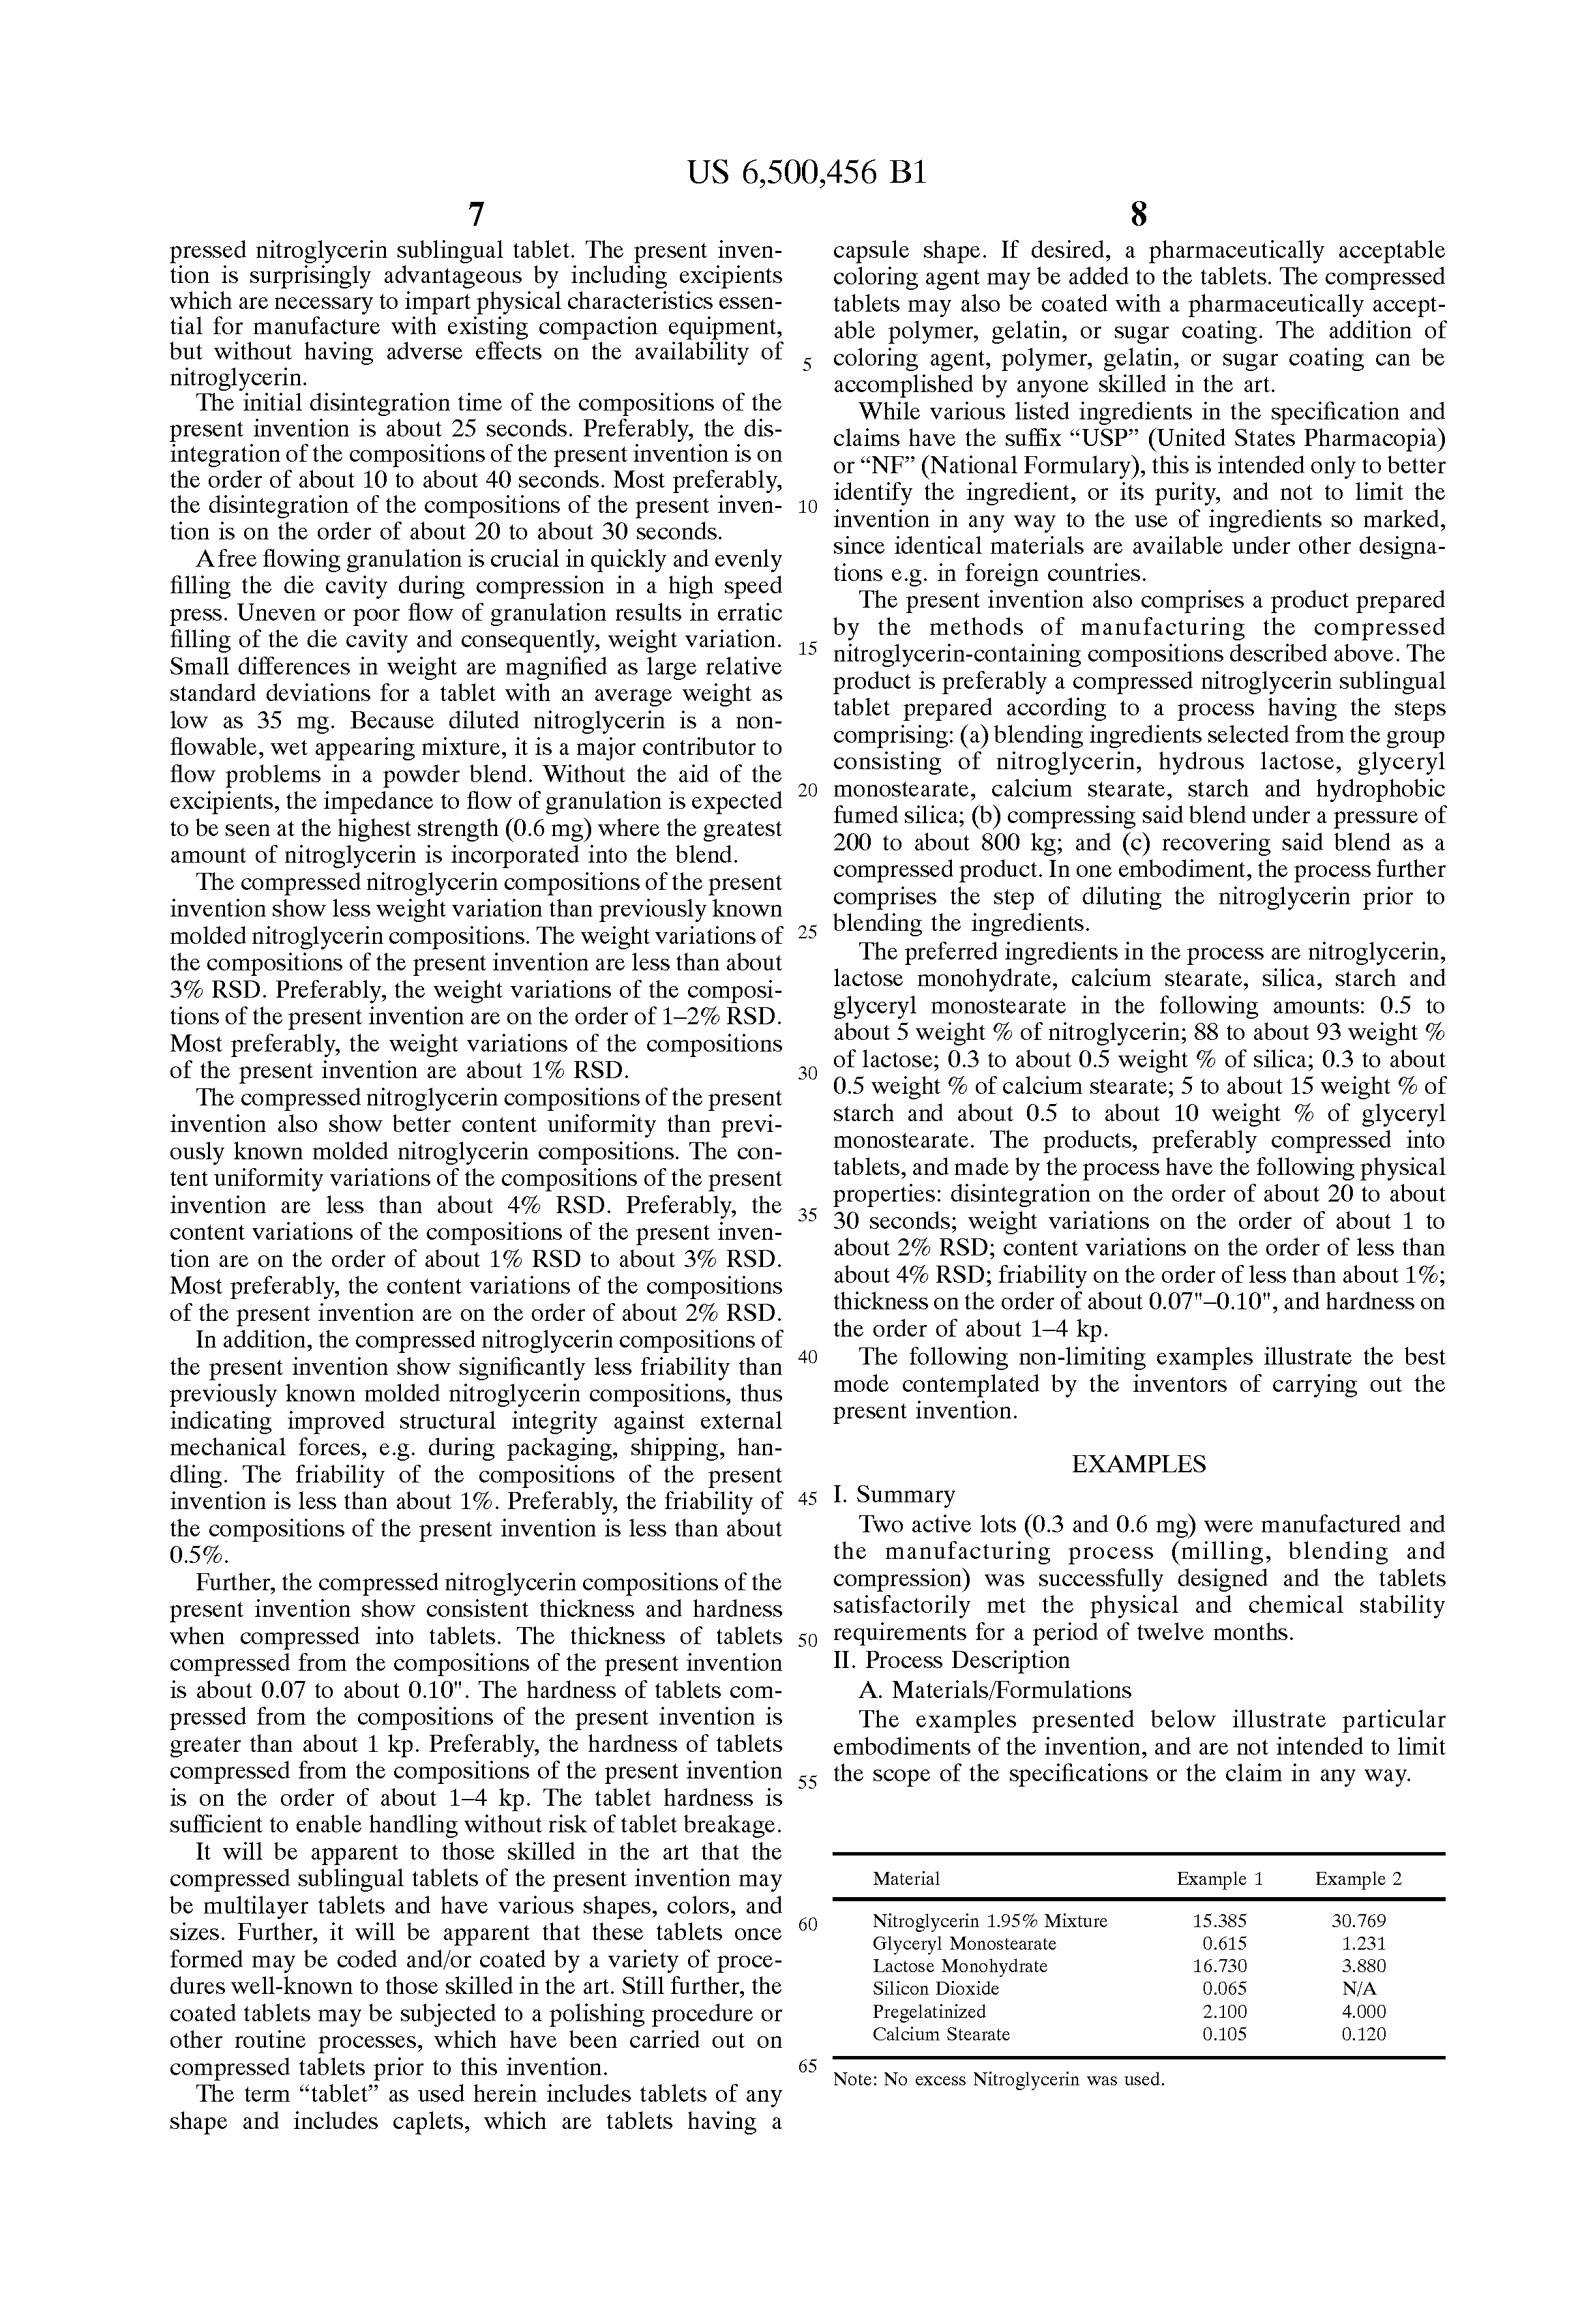 abilify vs risperdal